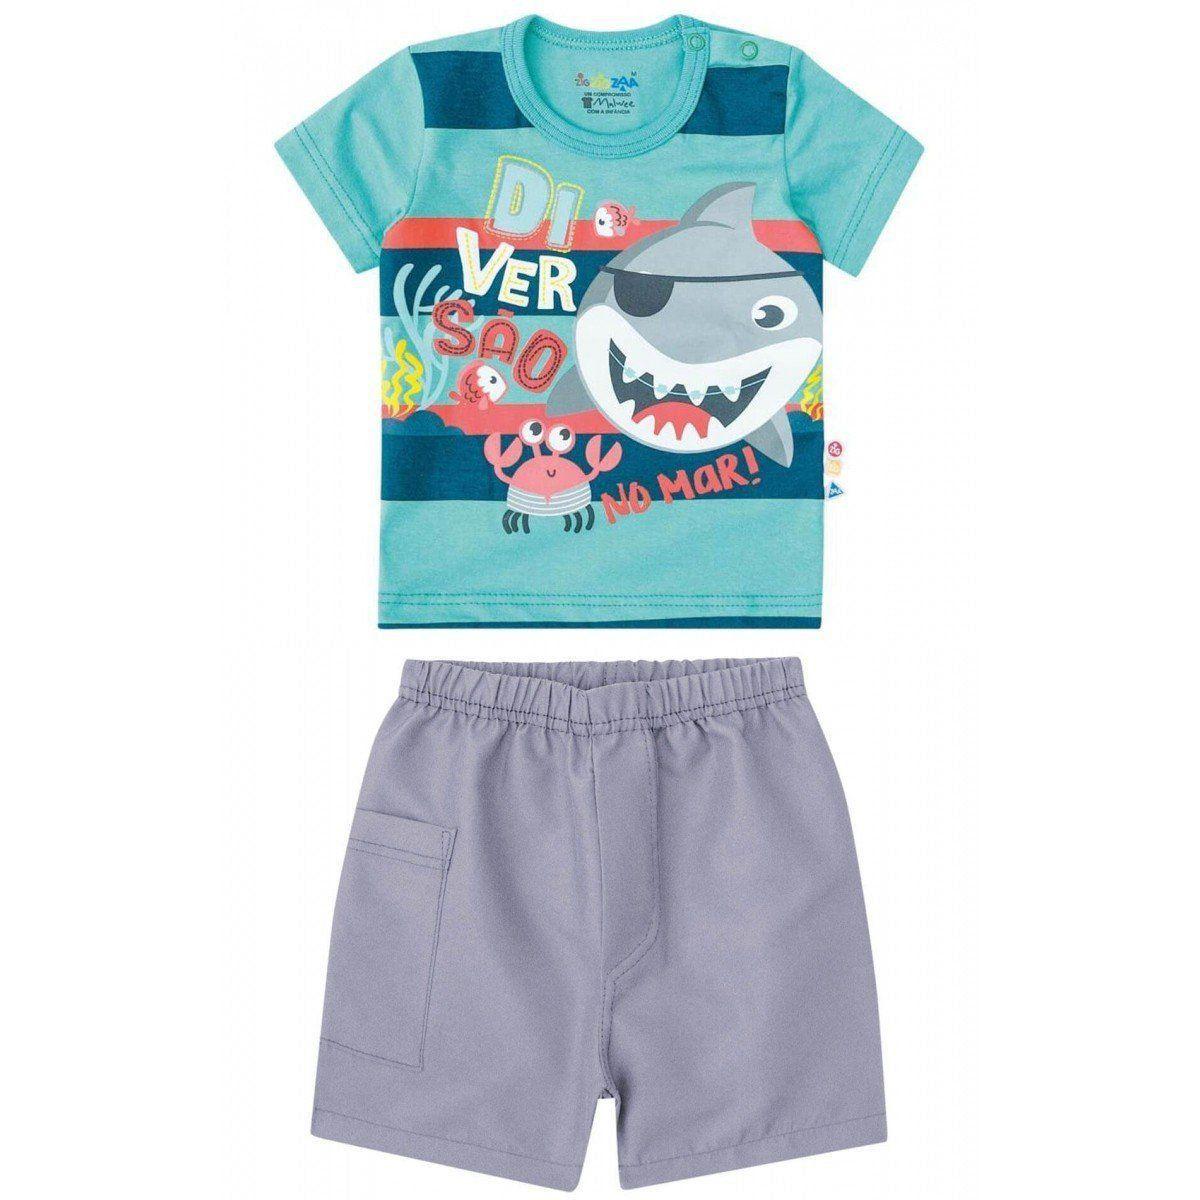 Conjunto Infantil Masculino Azul Diversão no Mar Zig Zig Zaa